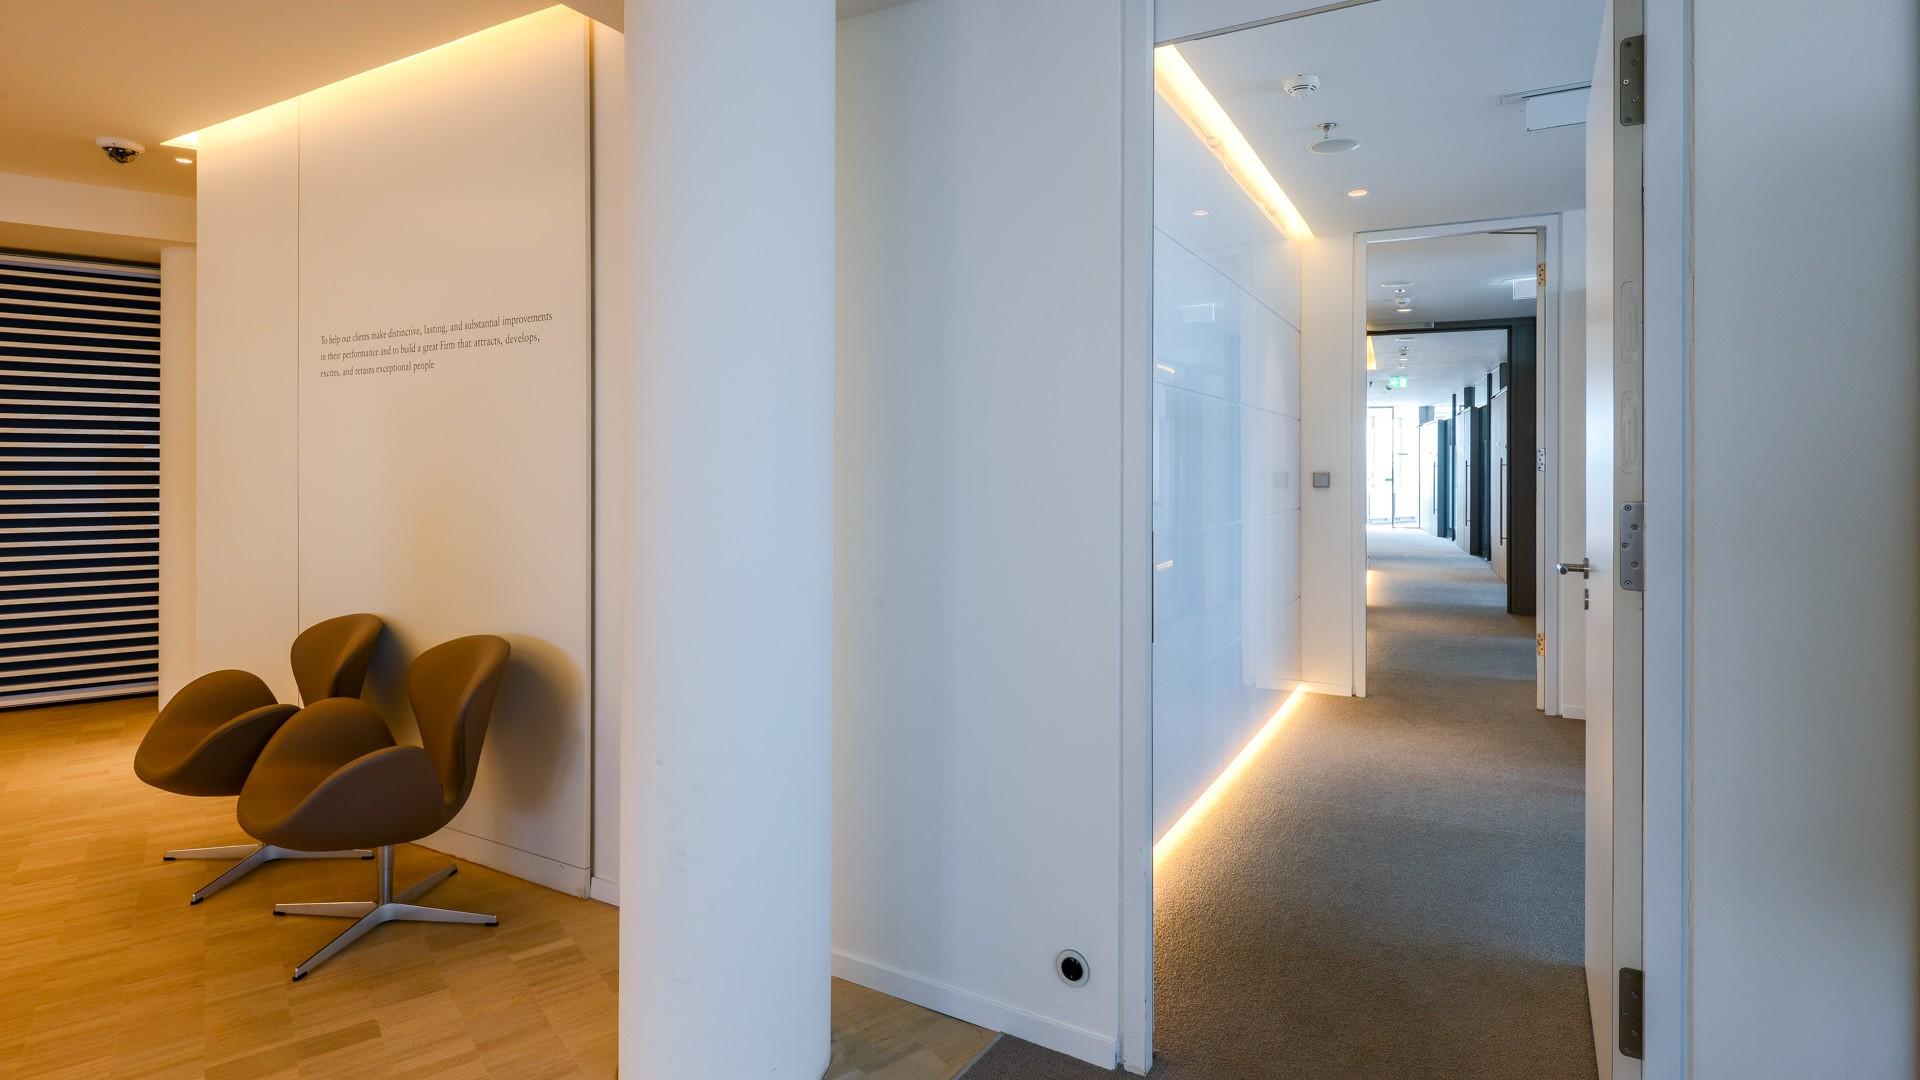 Galeriebild / Internationale Unternehmensberatung, Hamburg